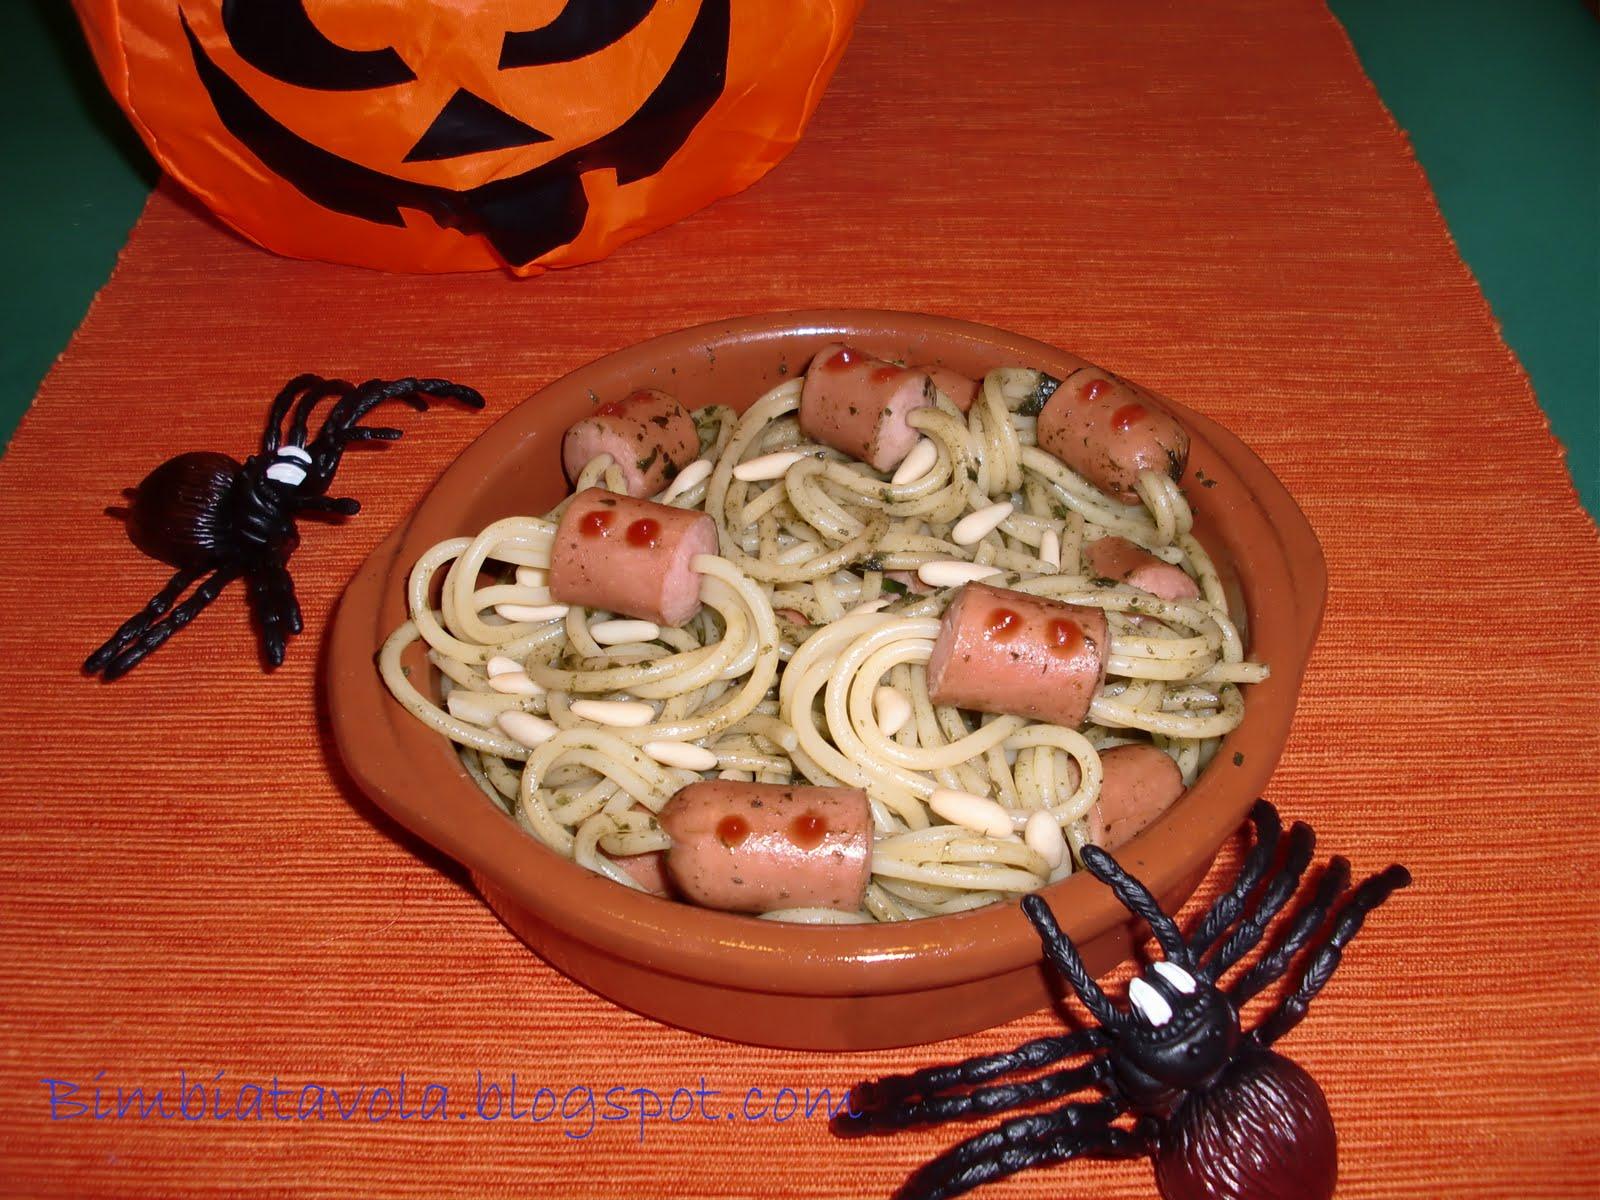 bimbi a tavola: Spaghetti ragno e idee per halloween